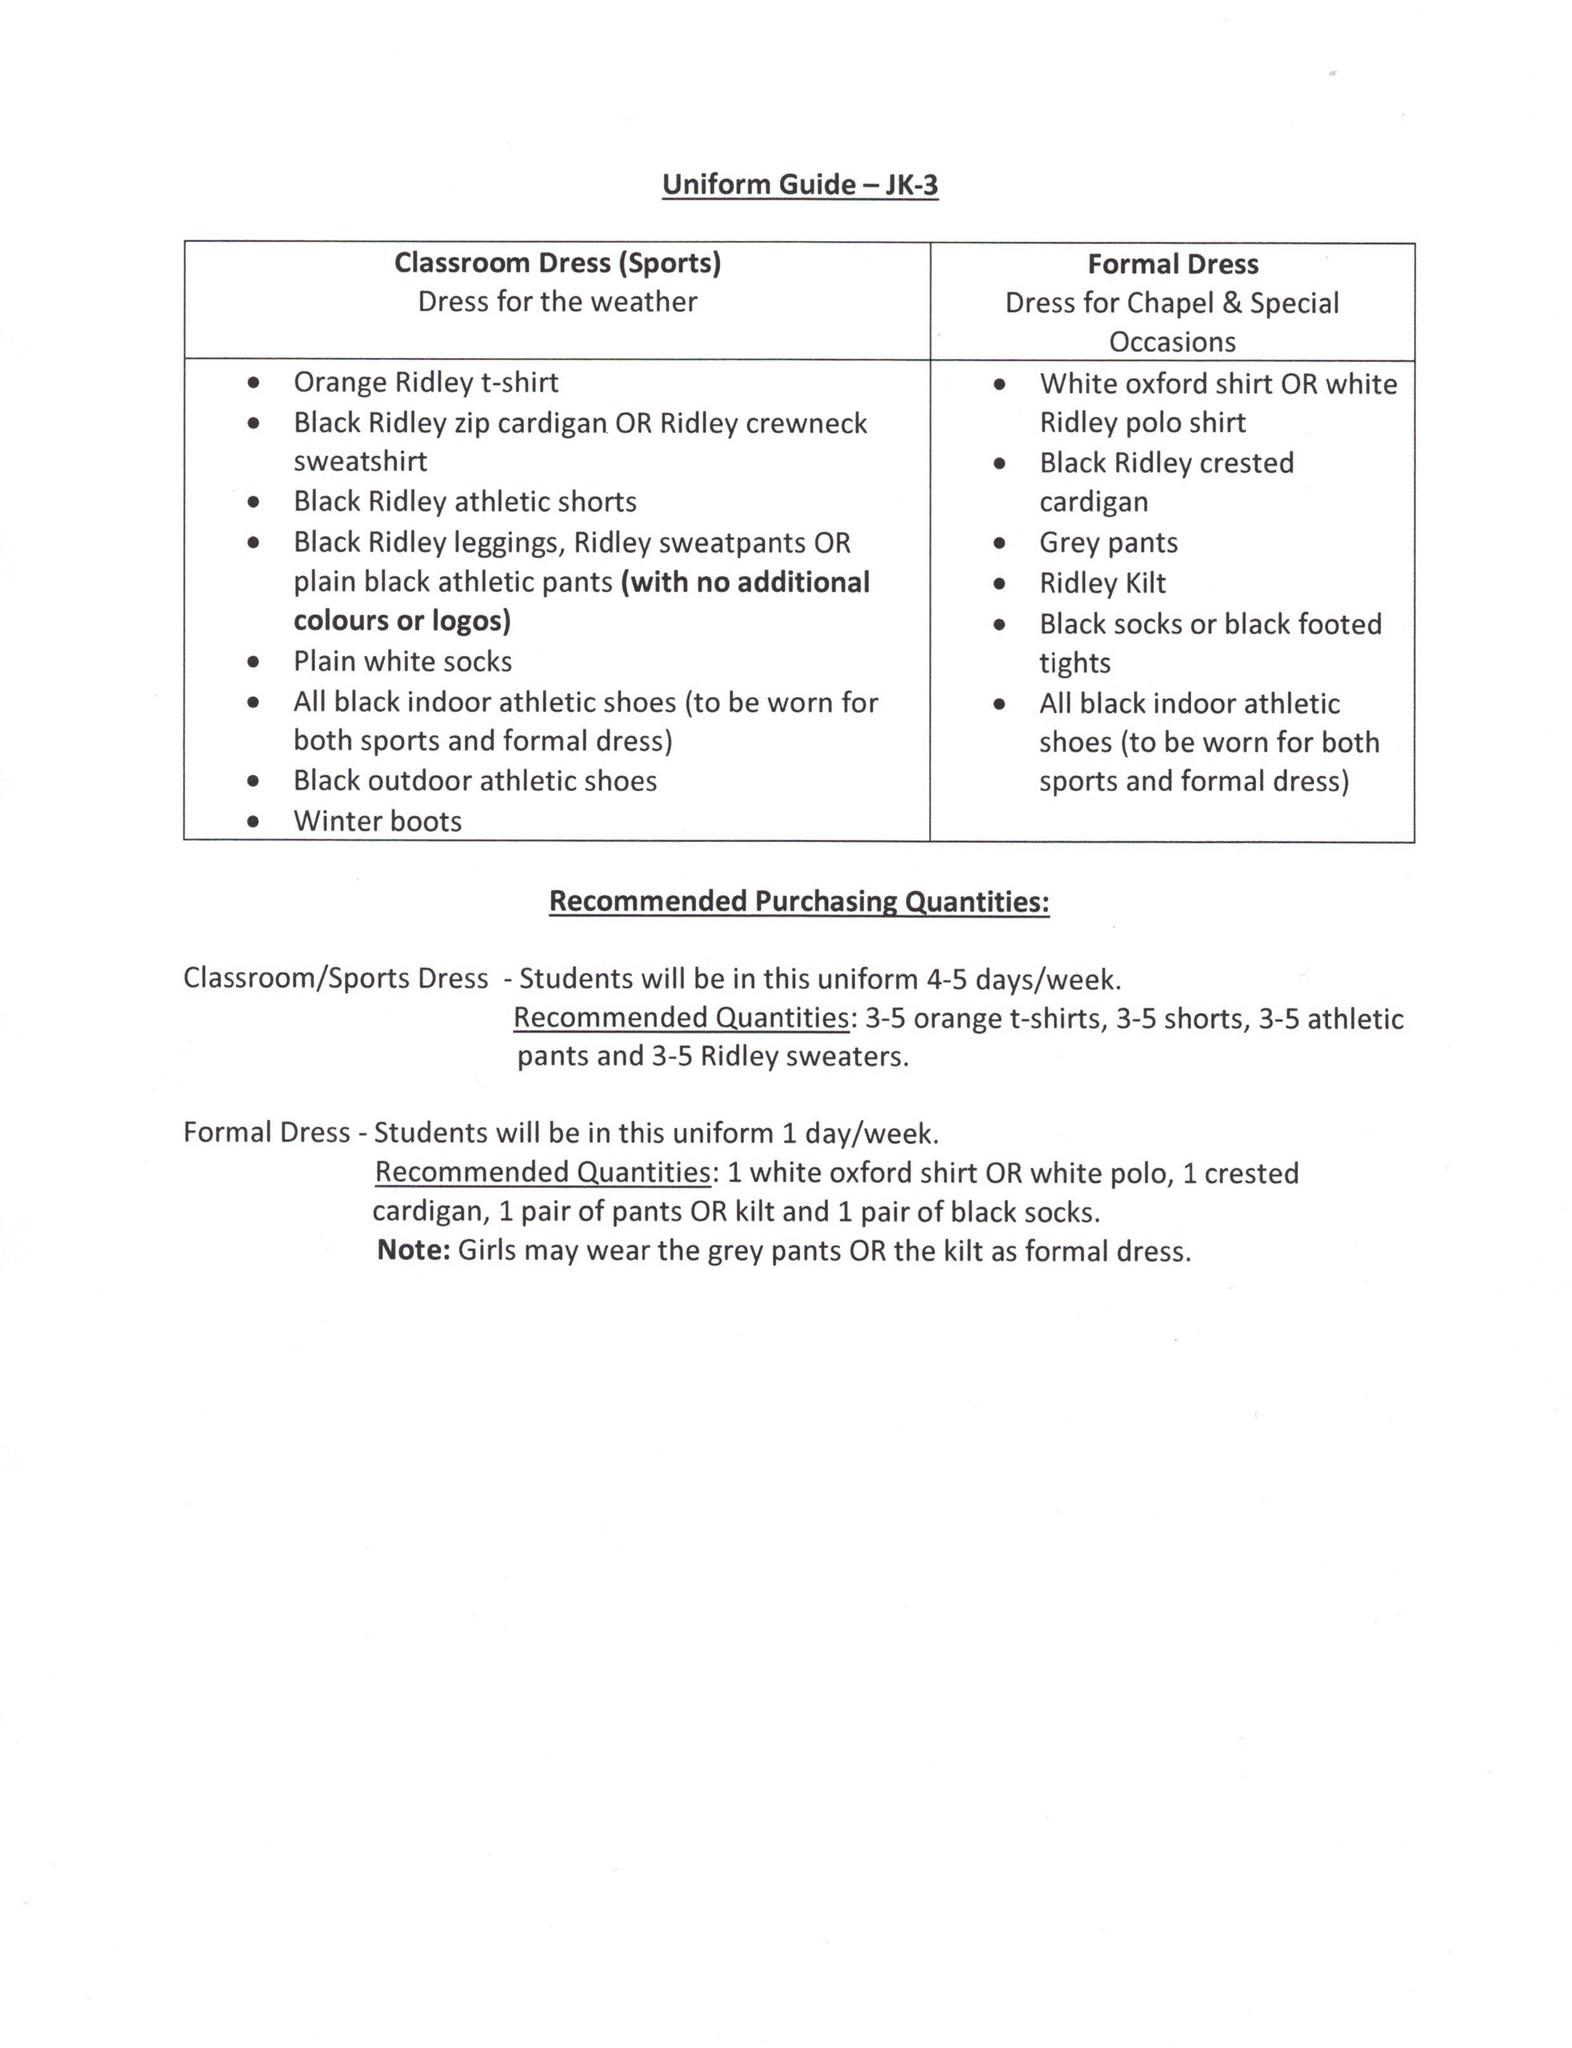 Uniform Guide (JK-3)